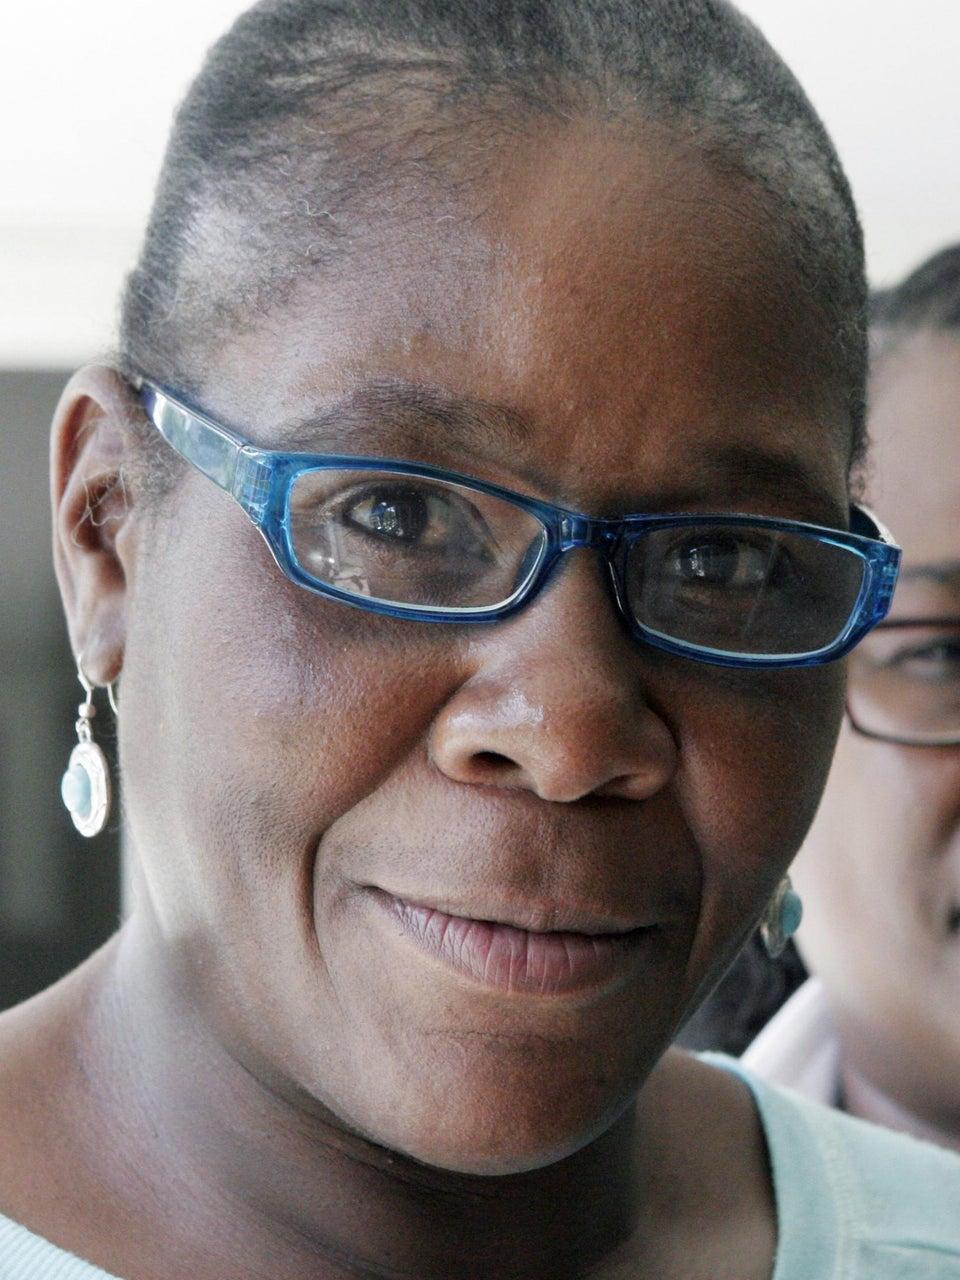 Marlene Pinnock Receives $1.5 Million Settlement from California Highway Patrol